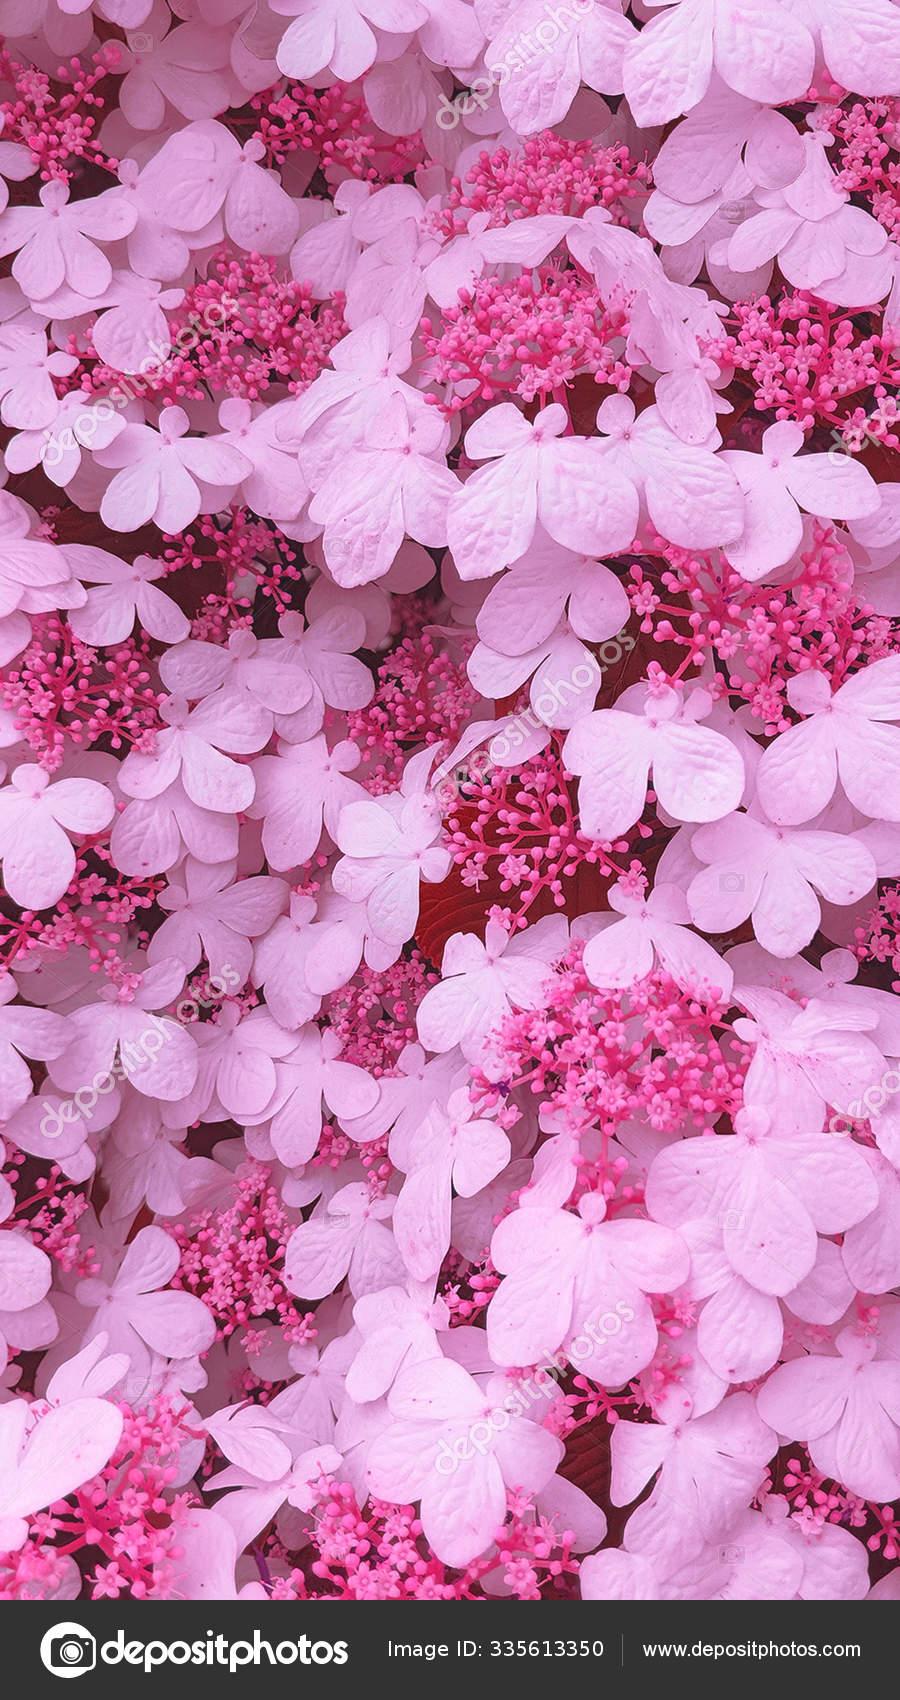 Fashion Aesthetic Wallpaper Phone White Flowers On Black Background Stock Photo C Porechenskaya 335613350